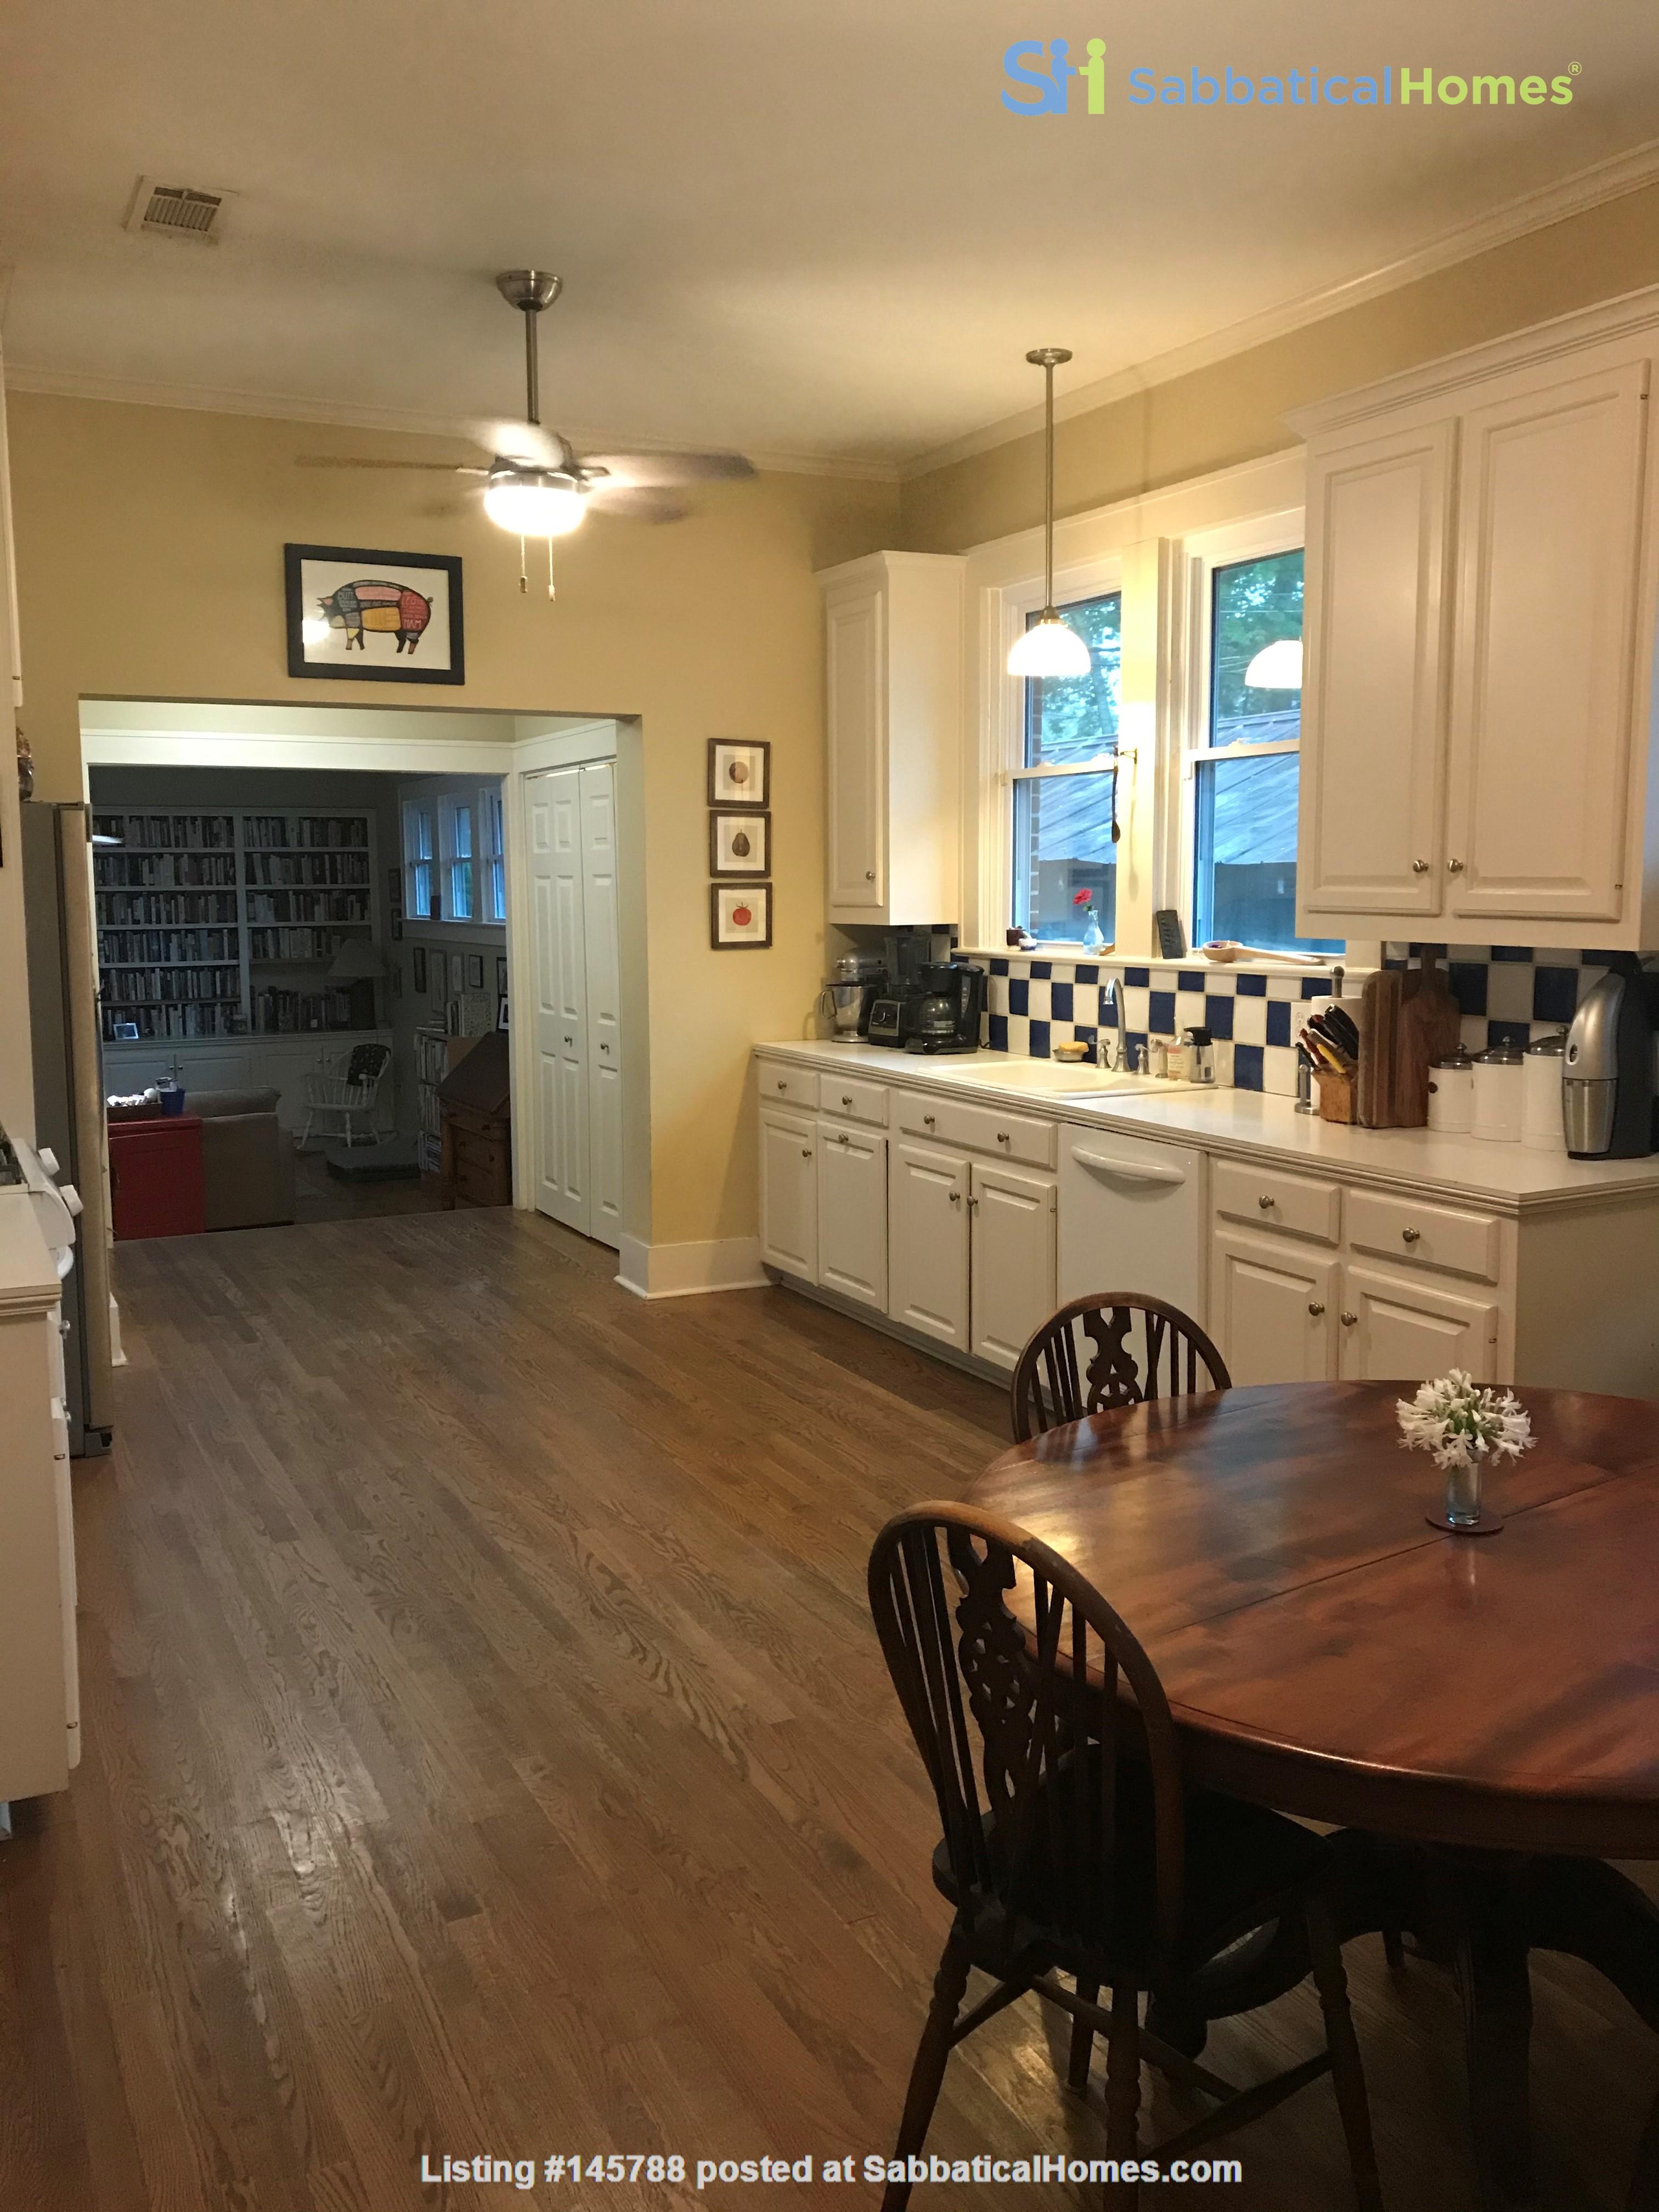 Charming 3 bedroom bungalow in Baton Rouge, Louisiana near LSU Home Rental in Baton Rouge 5